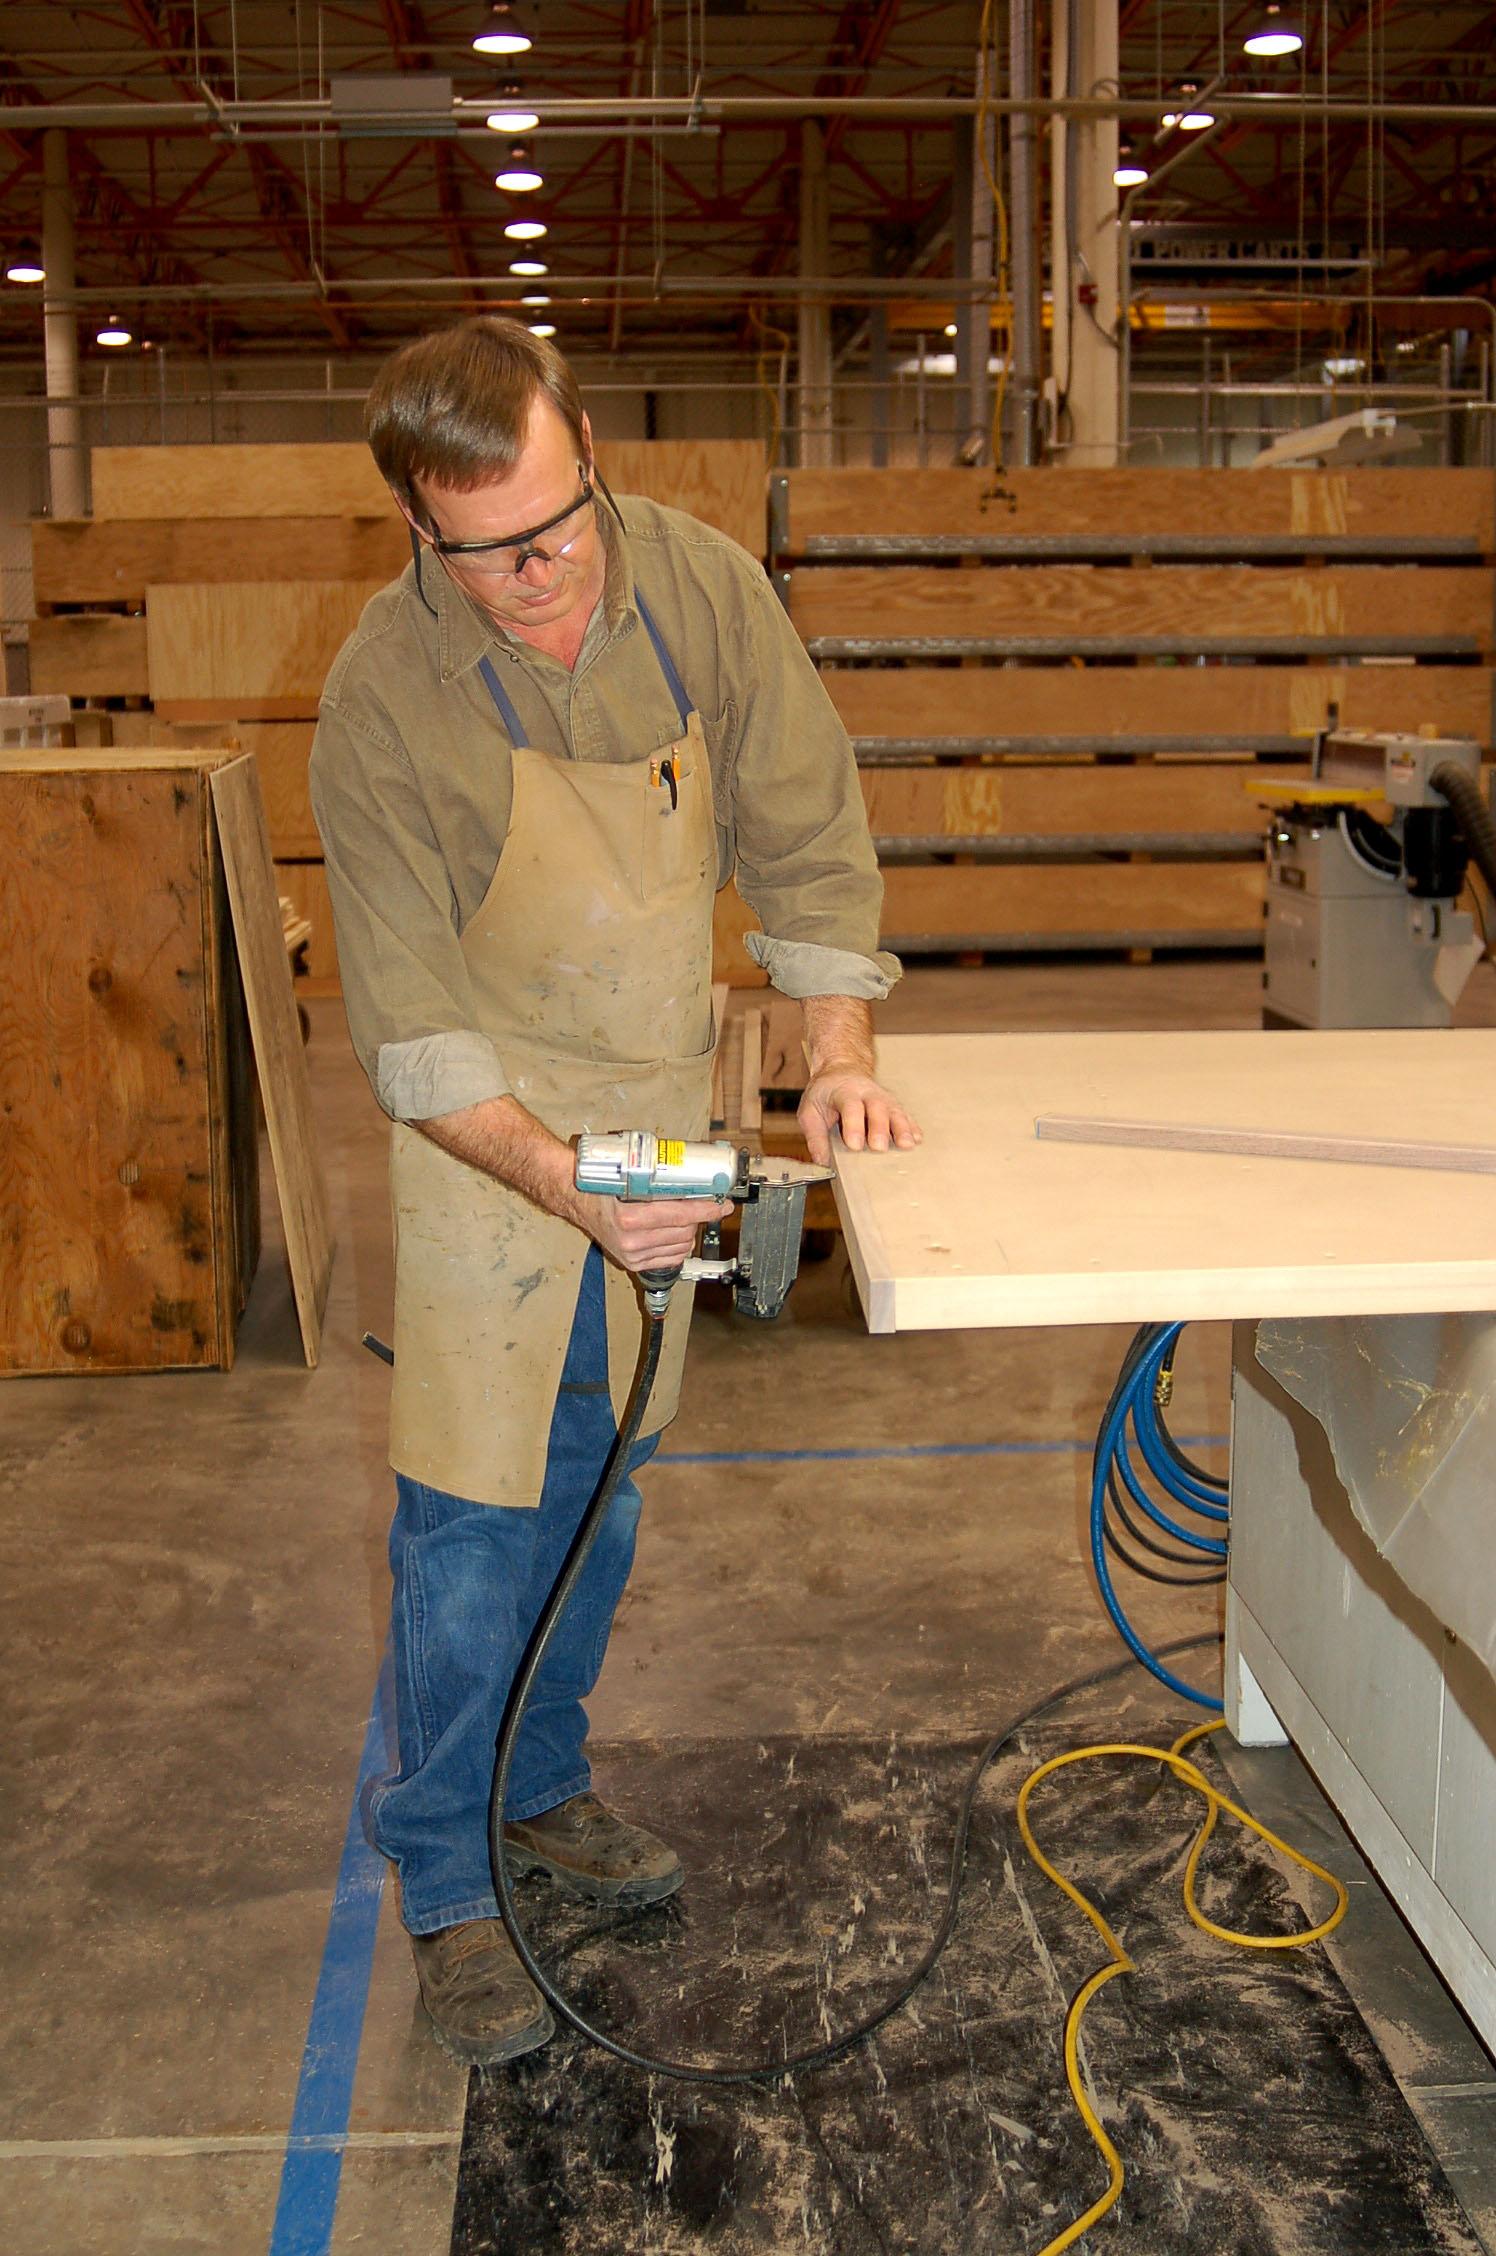 Wood shop key player in aircraft repair work > Hill Air